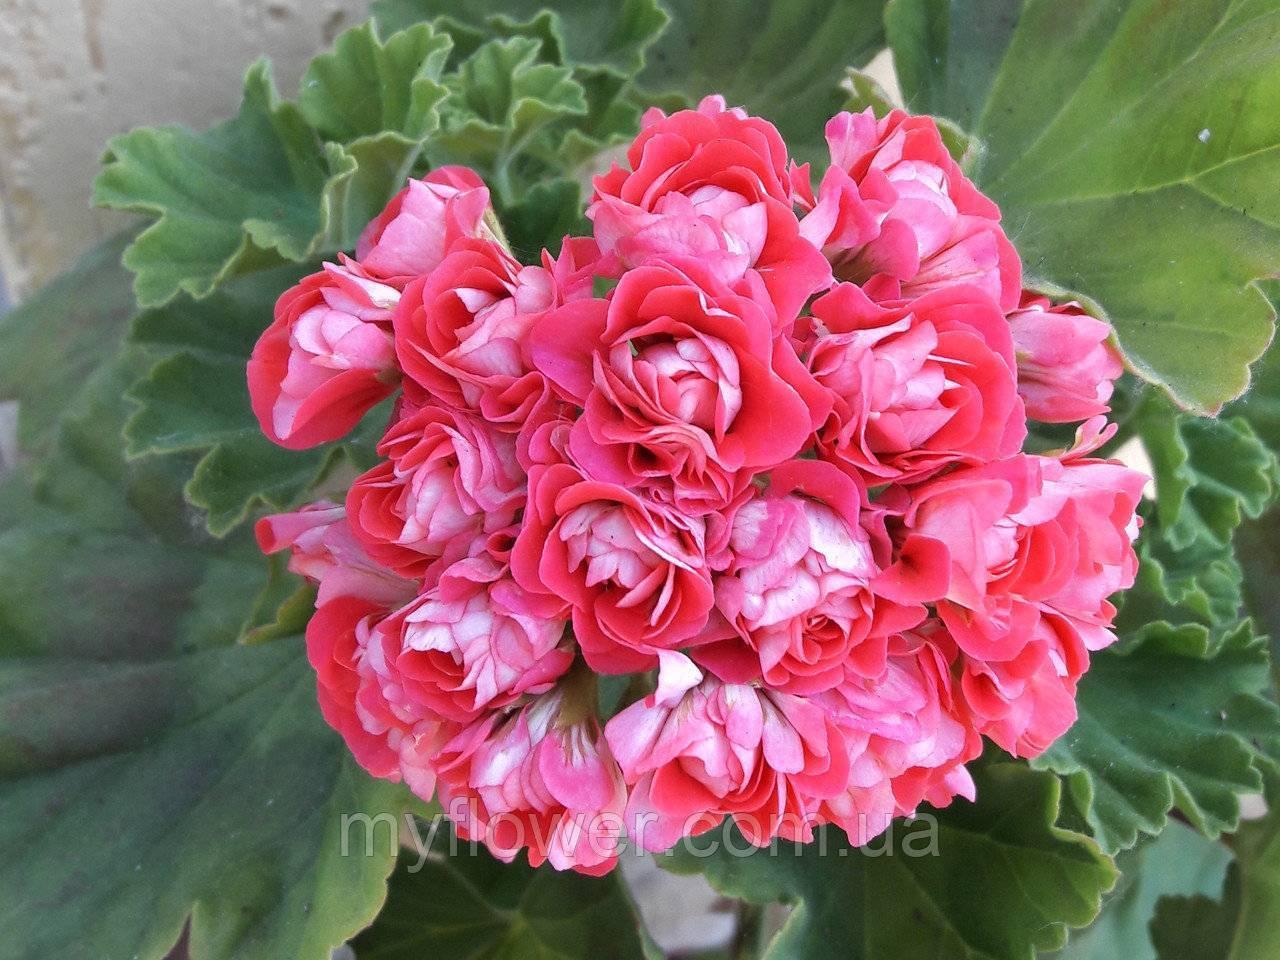 Пеларгония пак вива розита (pac viva rosita)